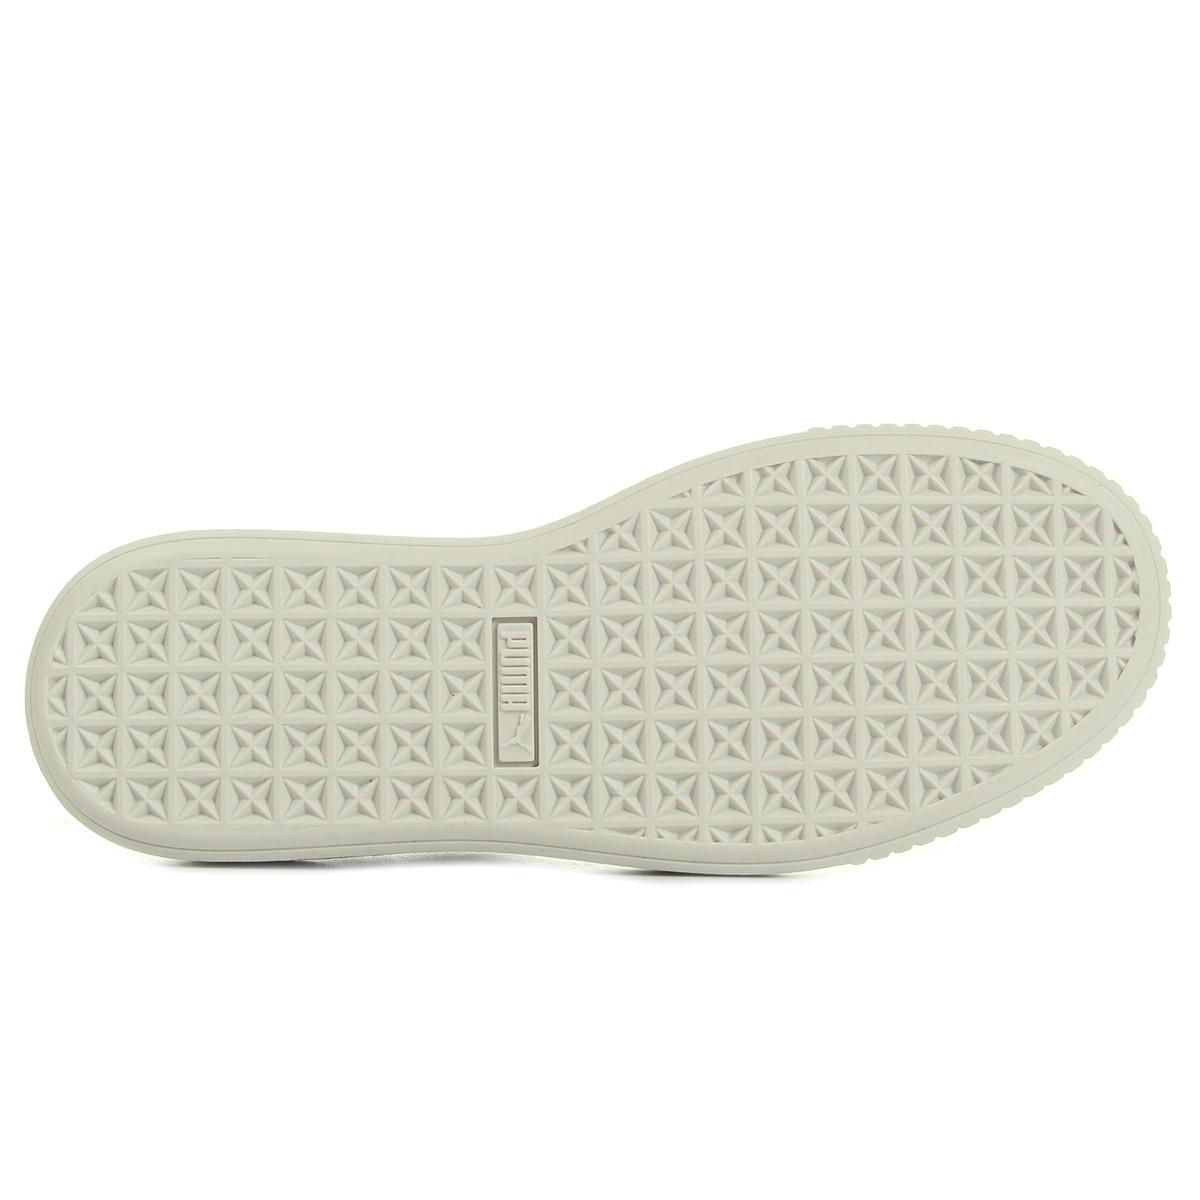 Platform Femme Wns 36331403Baskets Basket Puma Mode Patent hdQxrCst